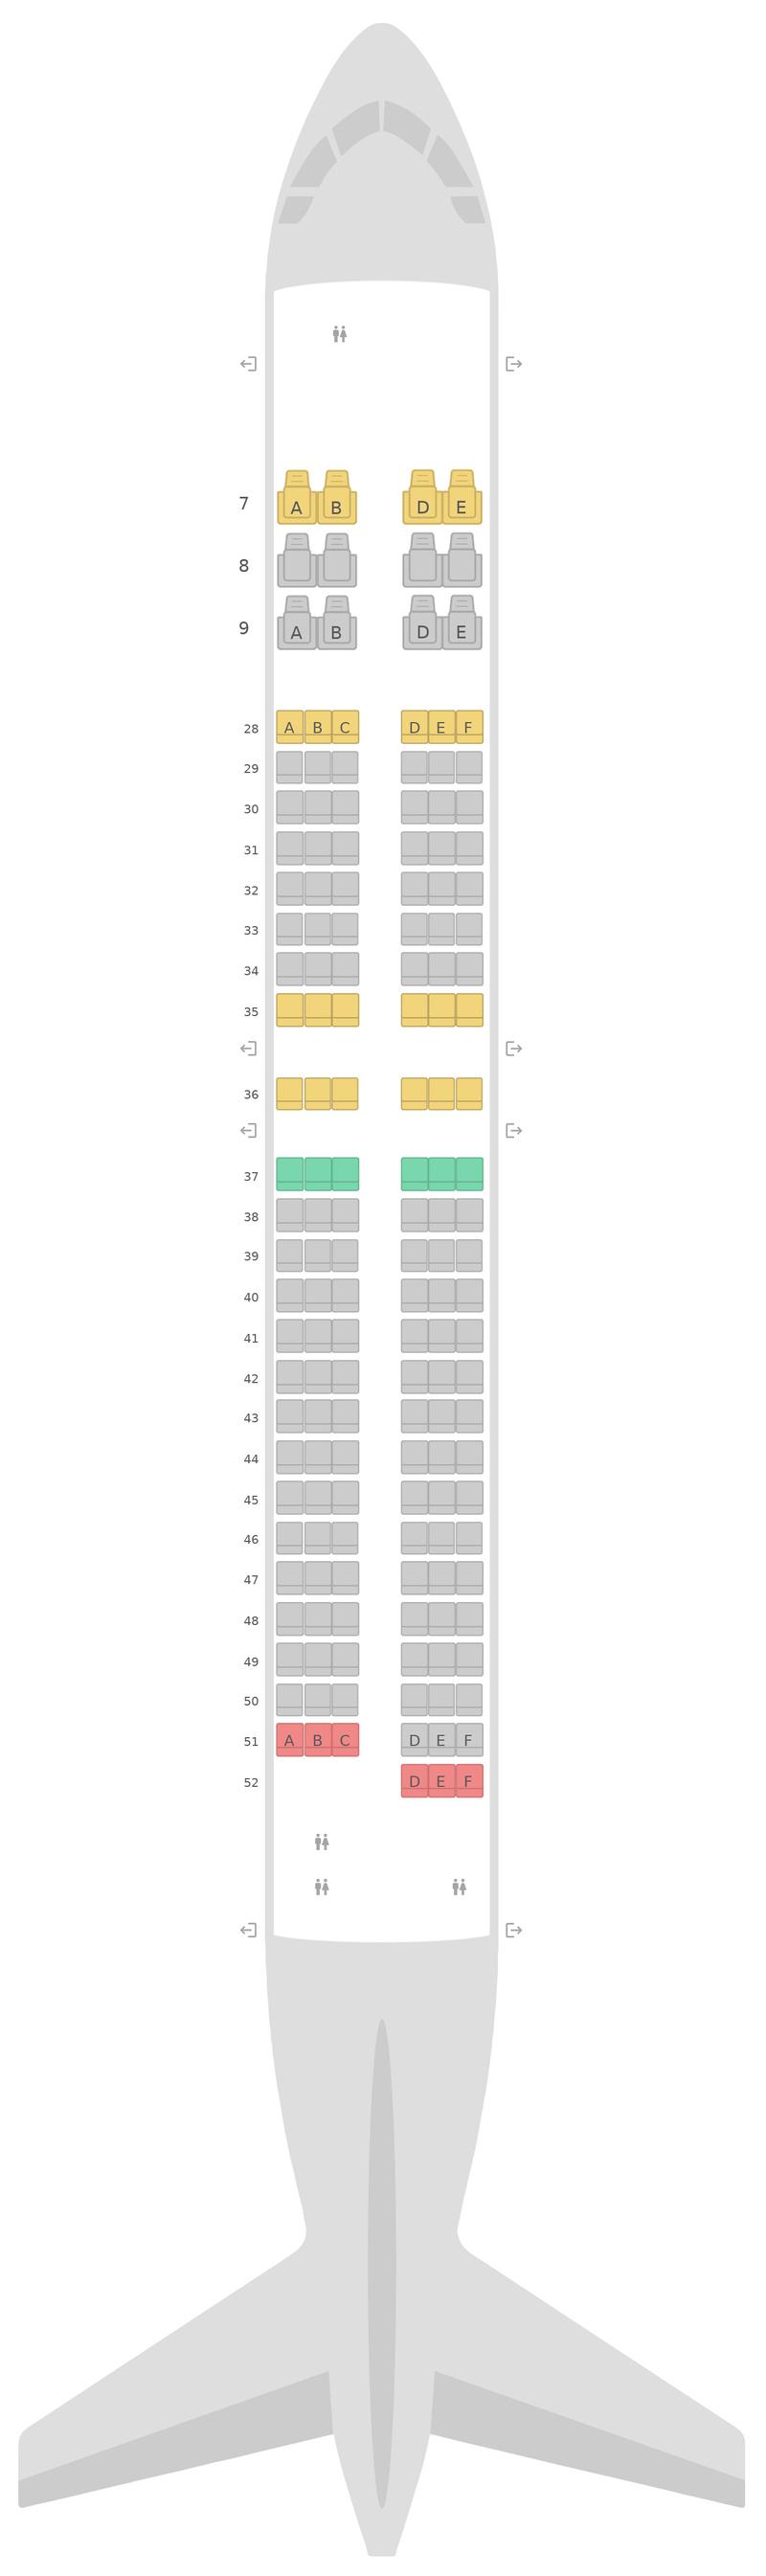 Mapa de asientos Boeing 737-900ER (739) Korean Air